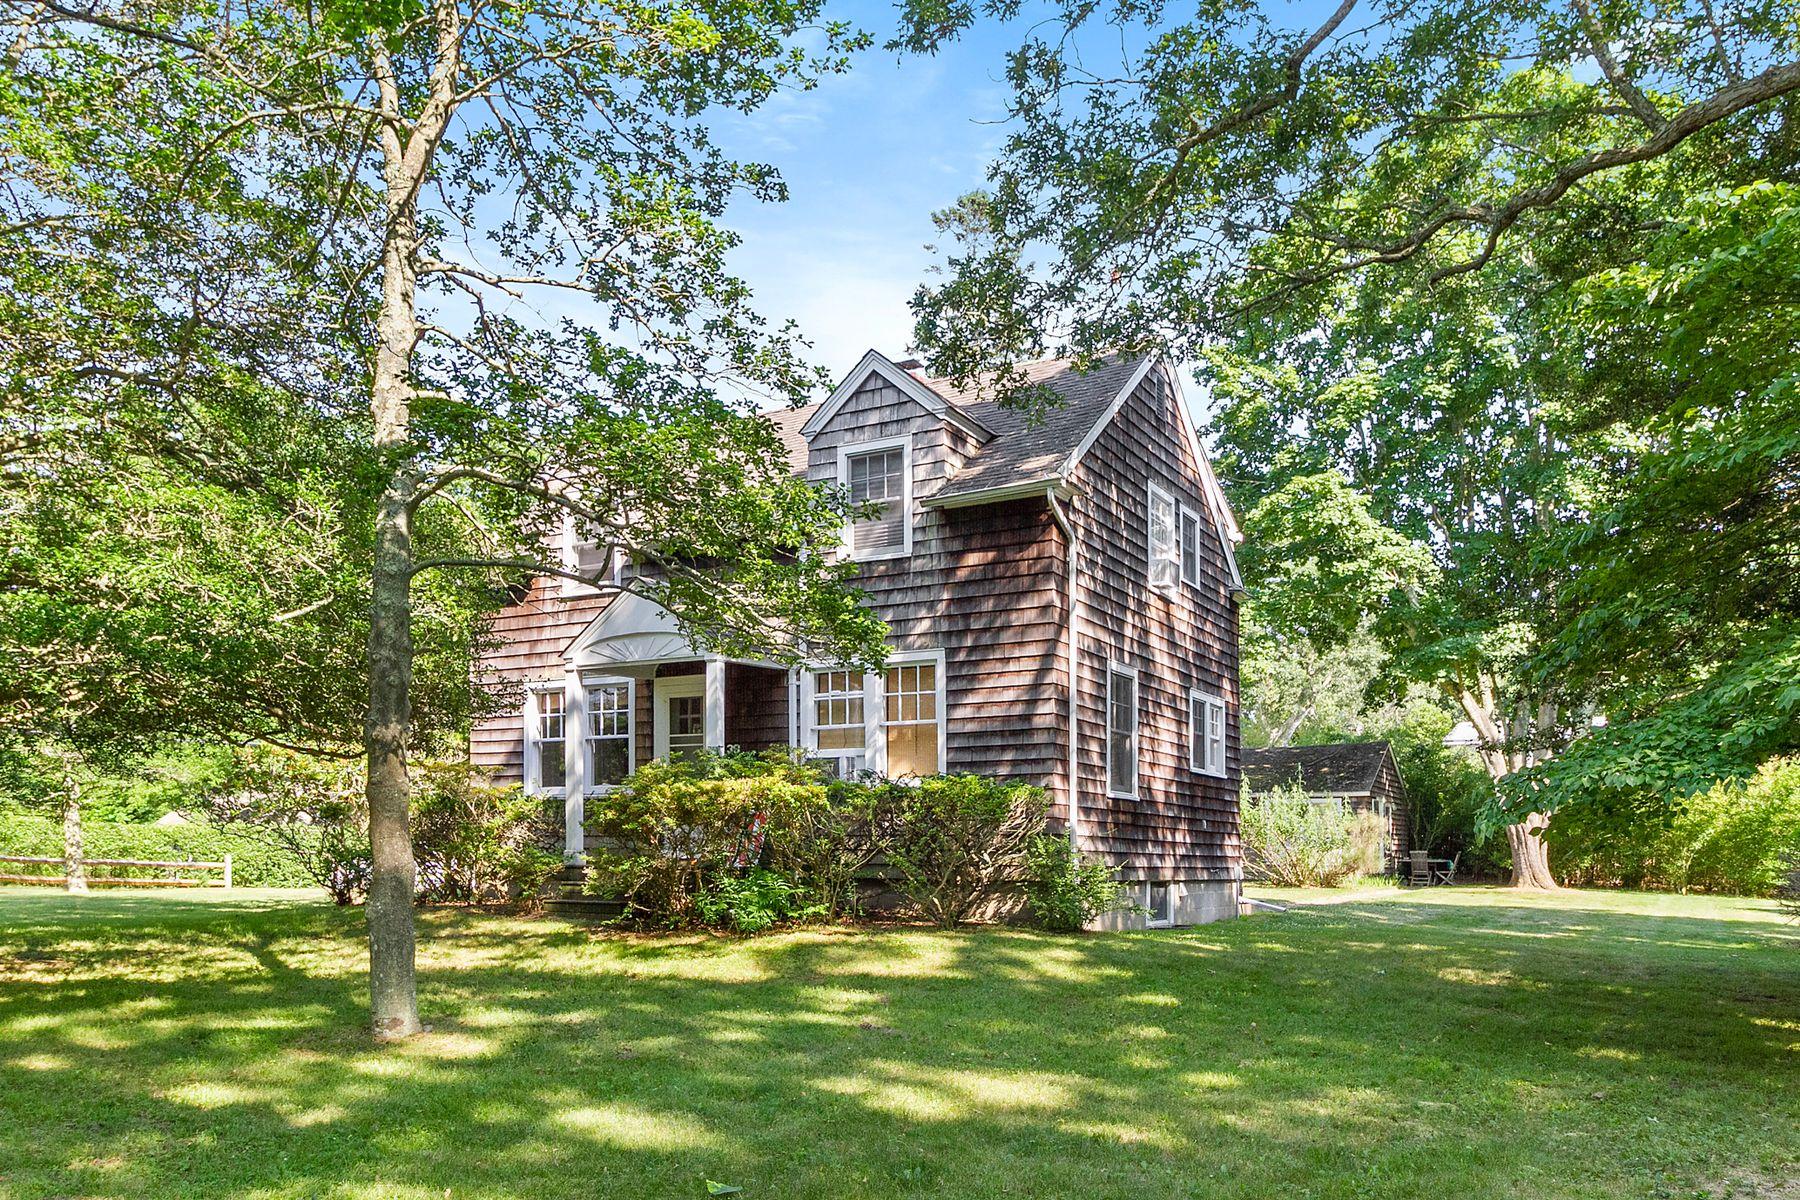 single family homes for Active at Sag Harbor Village Home & Artist Studio 38 Harrison Street Sag Harbor, New York 11963 United States